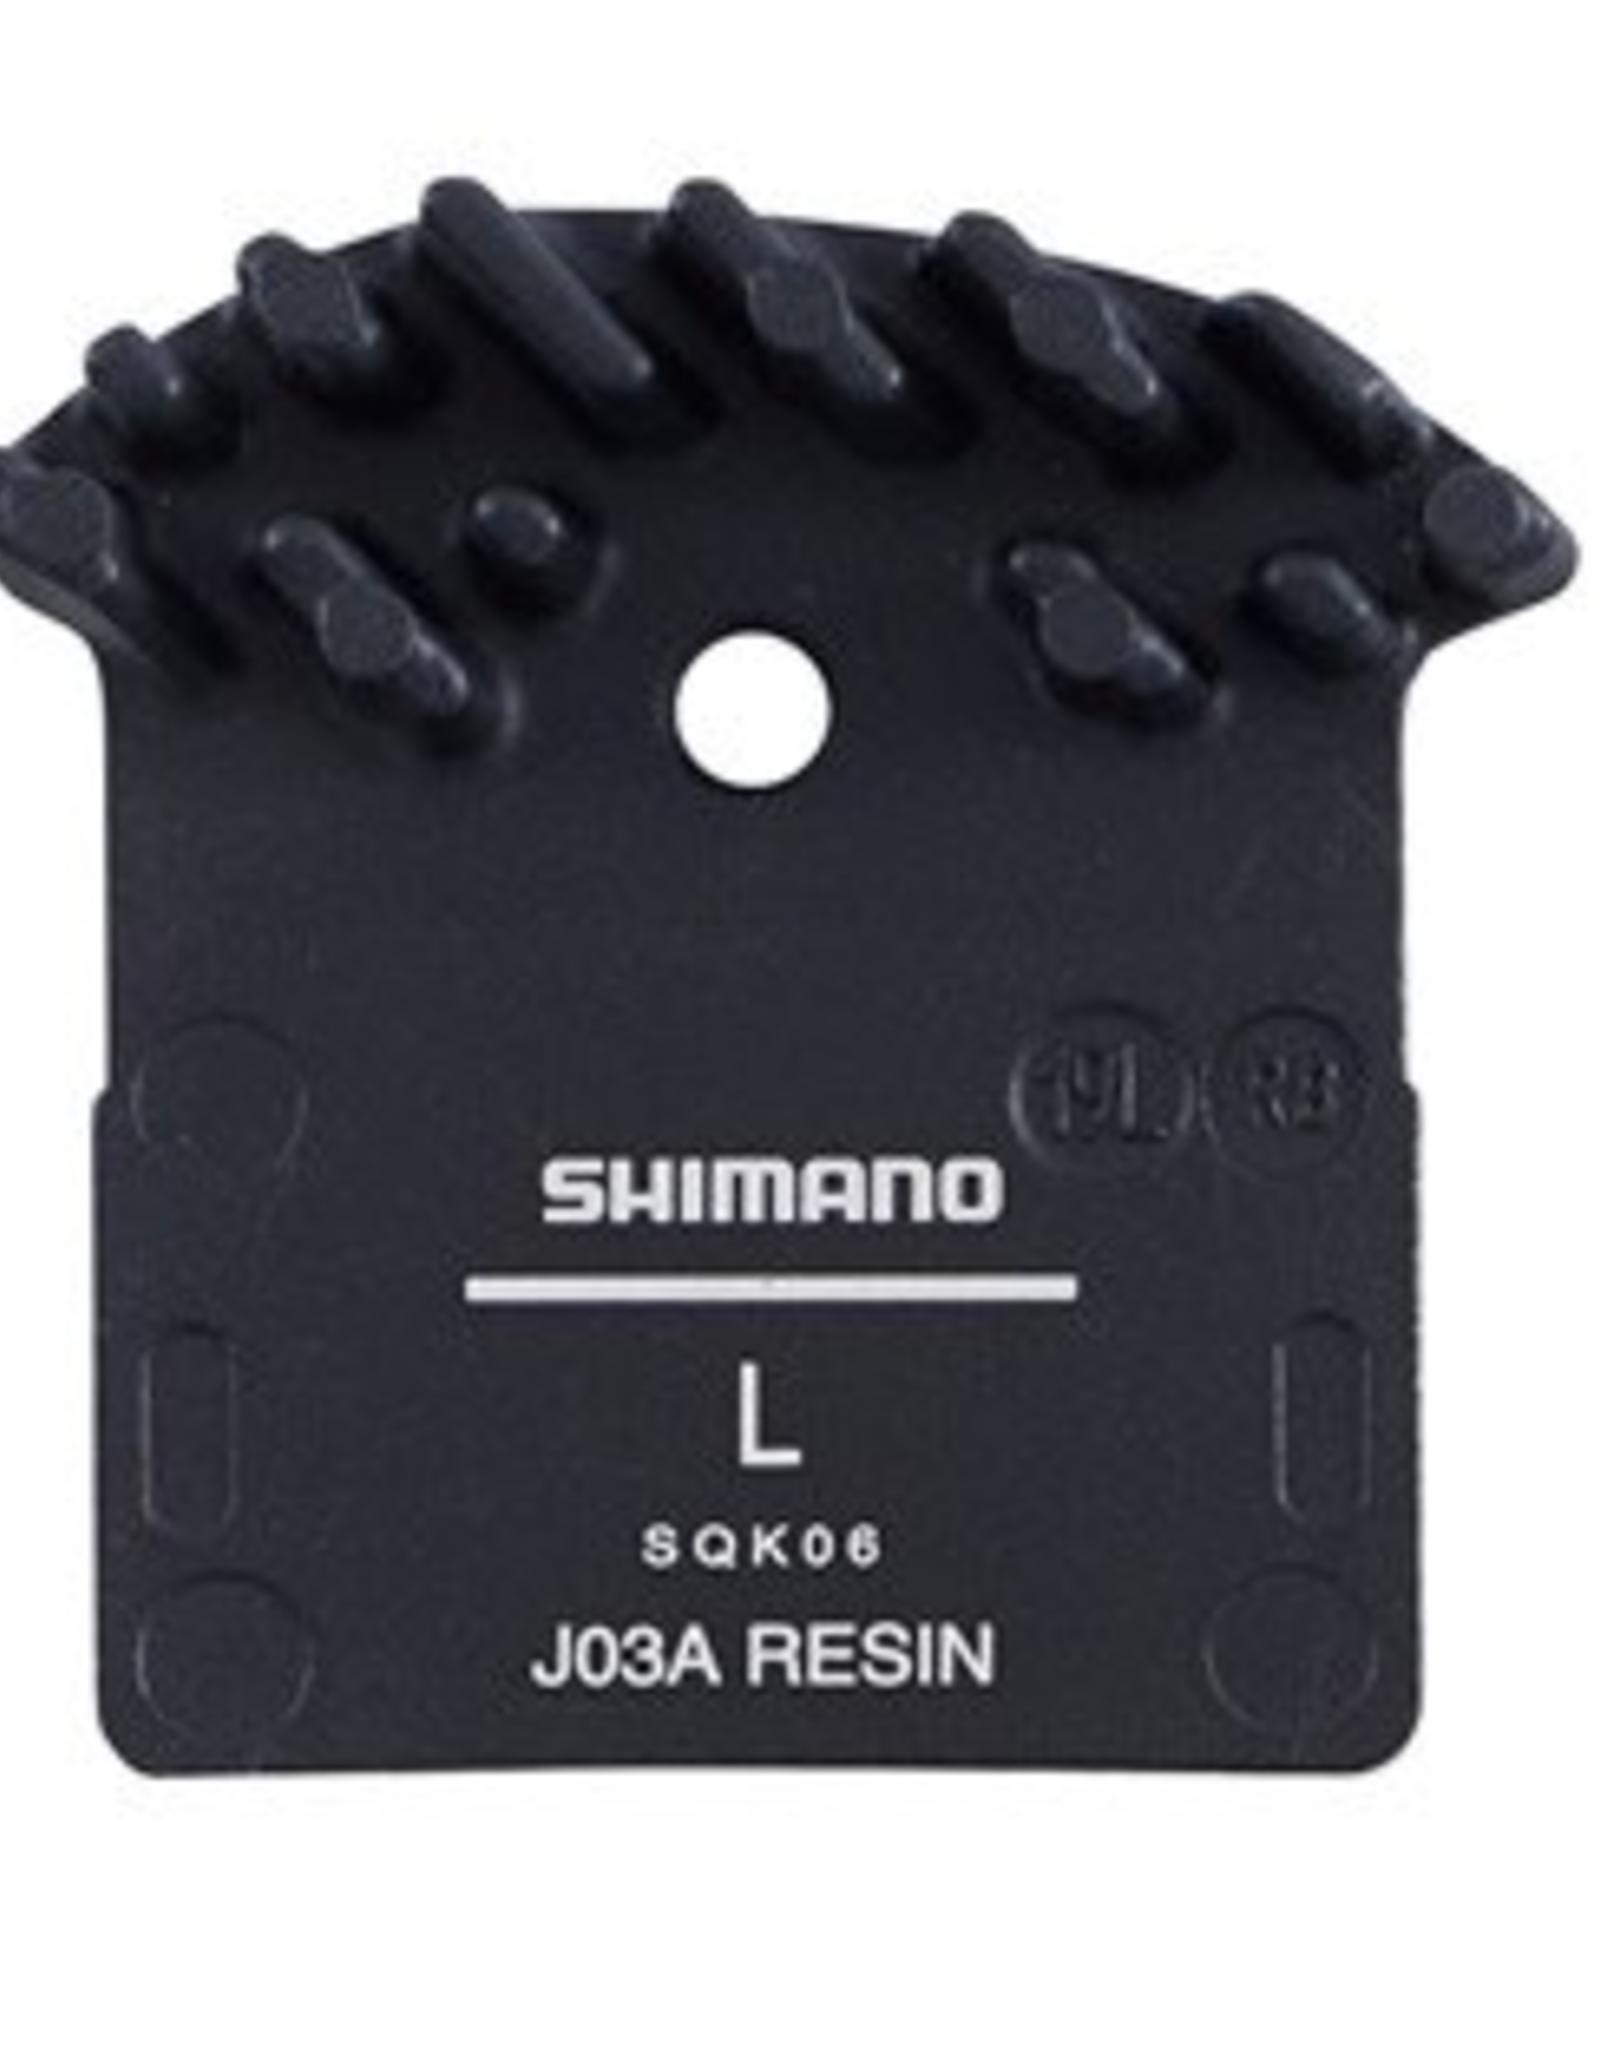 Shimano Spares Shimano J03A disc brake pads